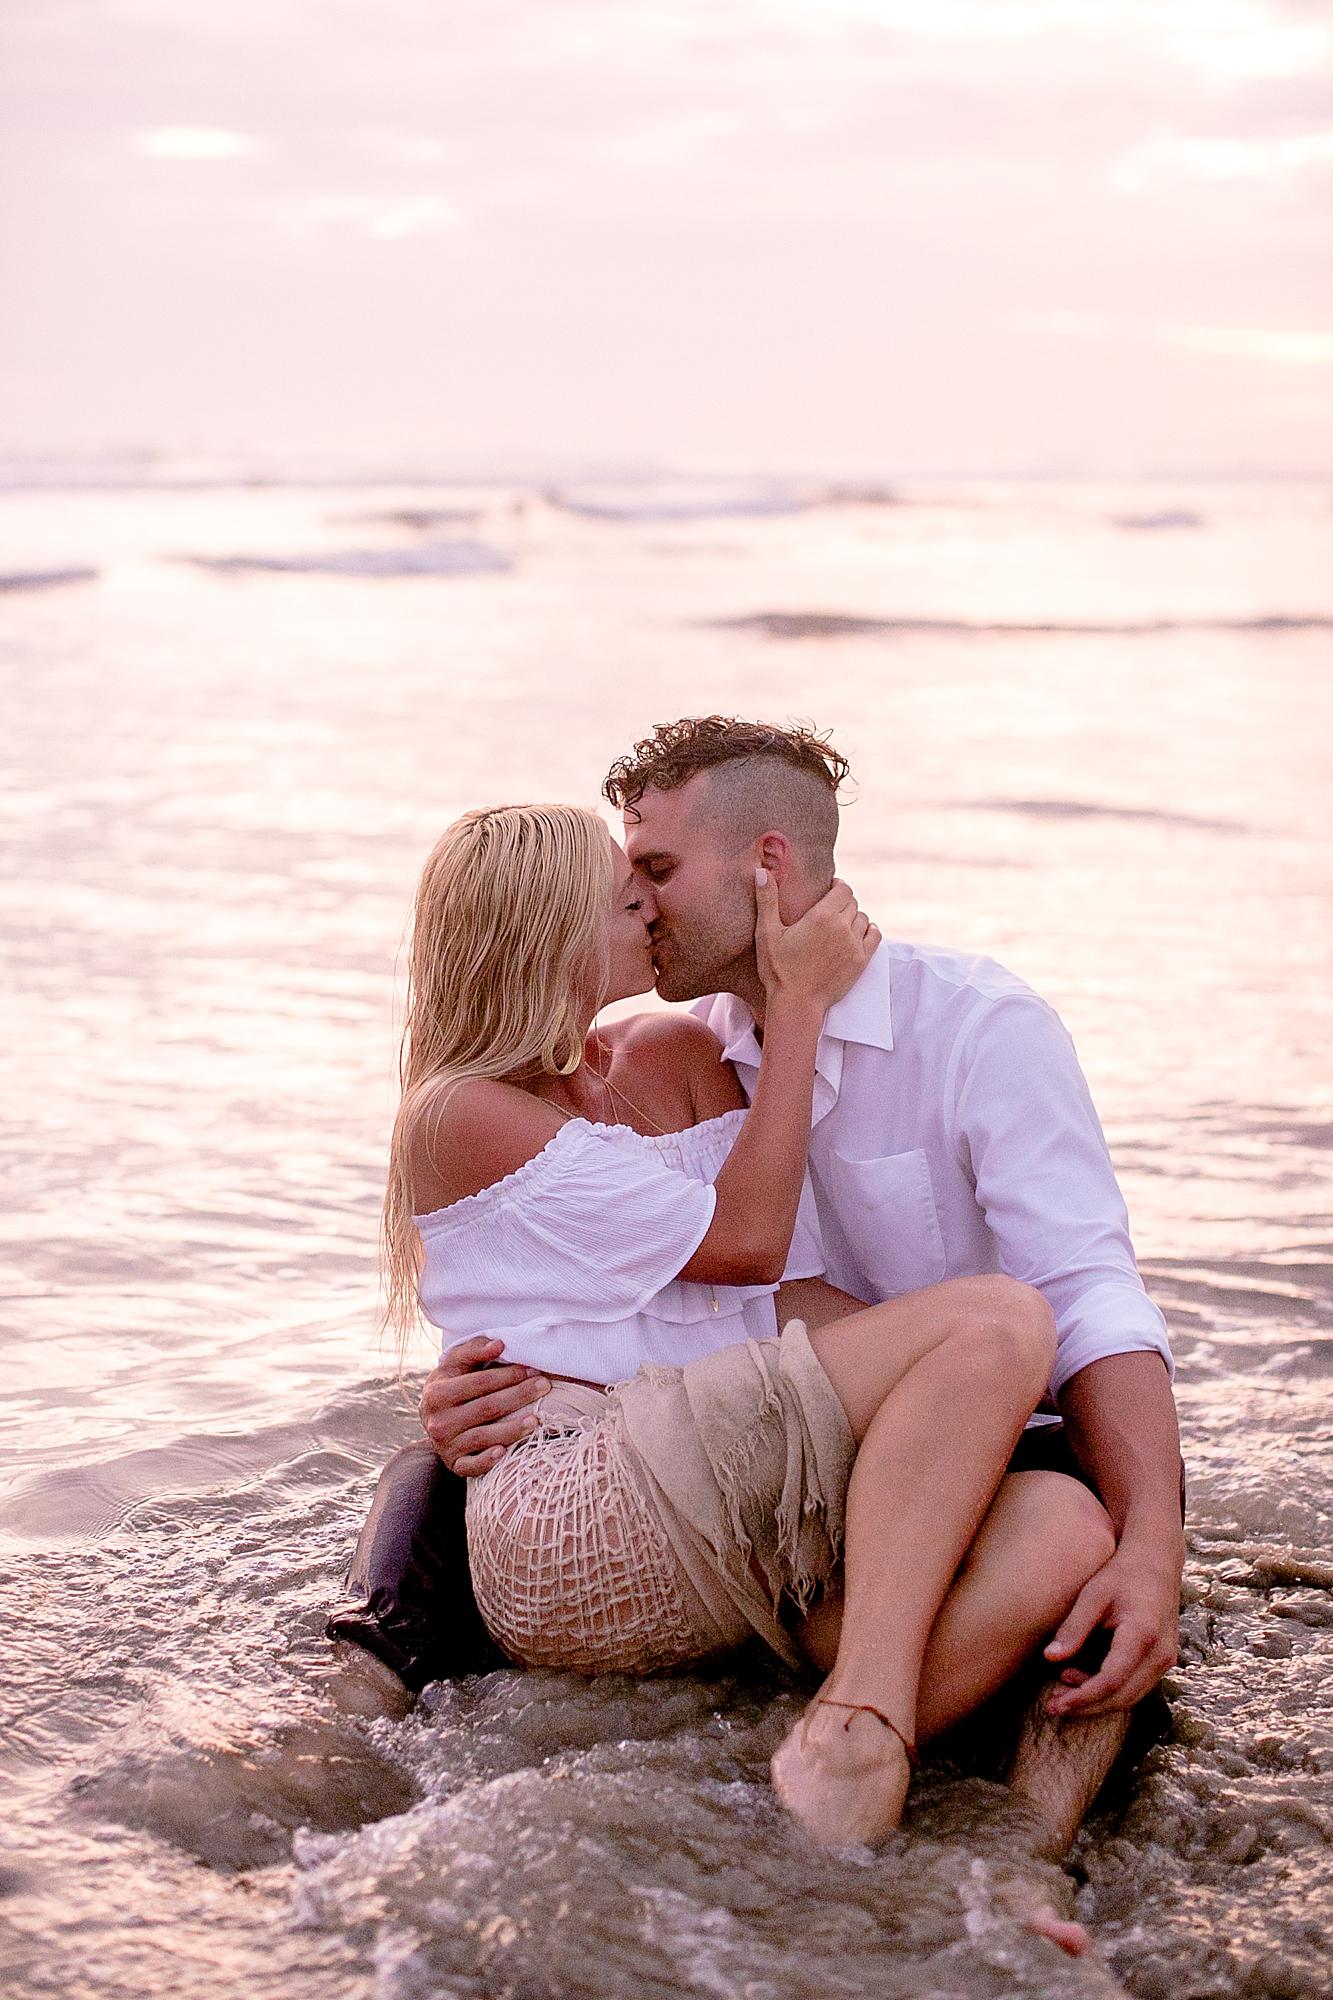 Epic and Adventurous Travel Wedding and Portrait Photographer in Nosara, Costa Rica - Kelee Bovelle @xokelee @keleeb - 27.jpg